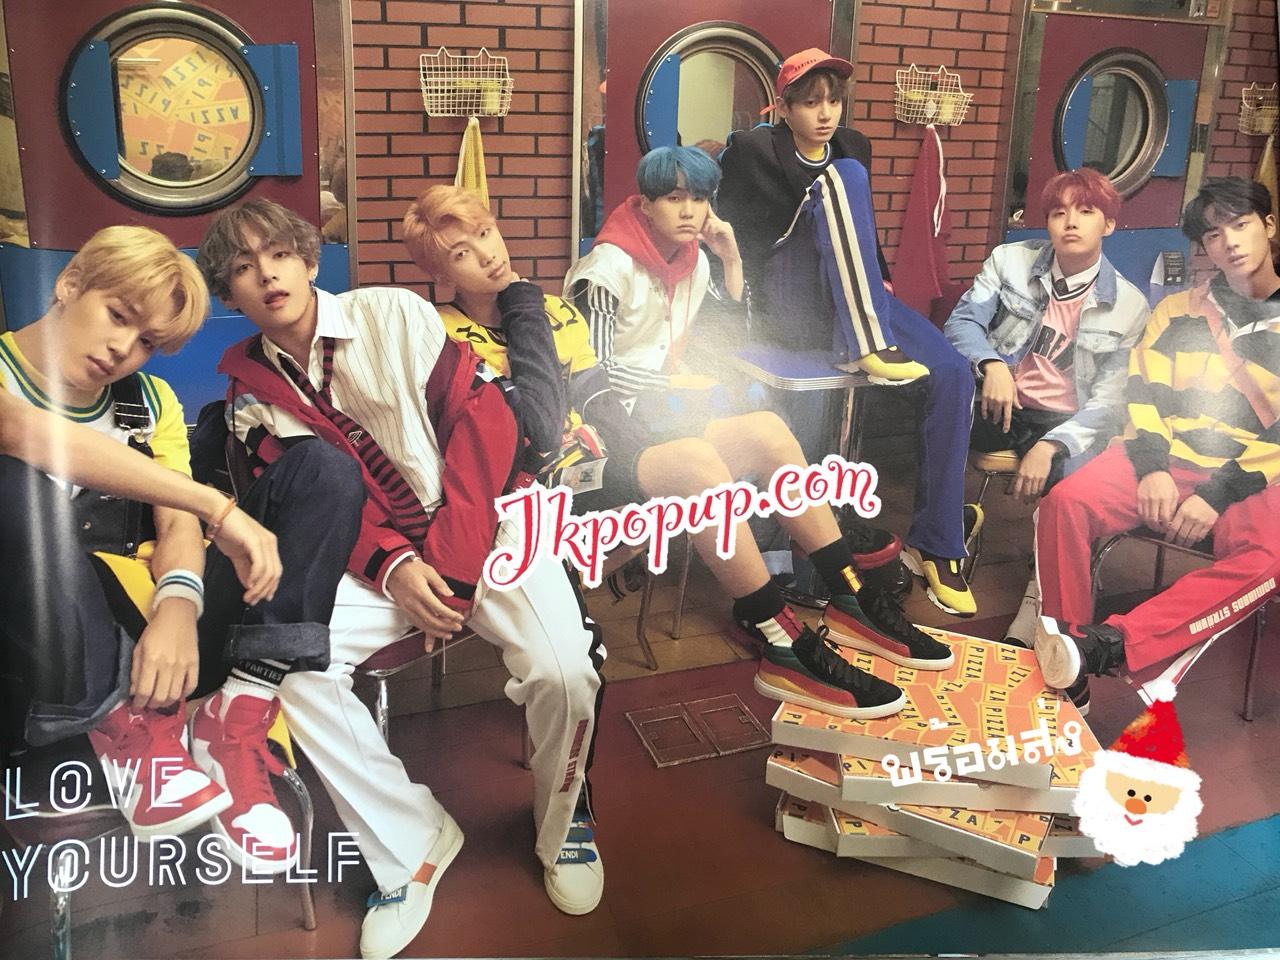 BTS - Mini Album Vol.5 [LOVE YOURSELF 承 Her] โปสเตอร์ แบบที่ 2 พร้อมกระบอกโปสเตอร์ พร้อมส่ง